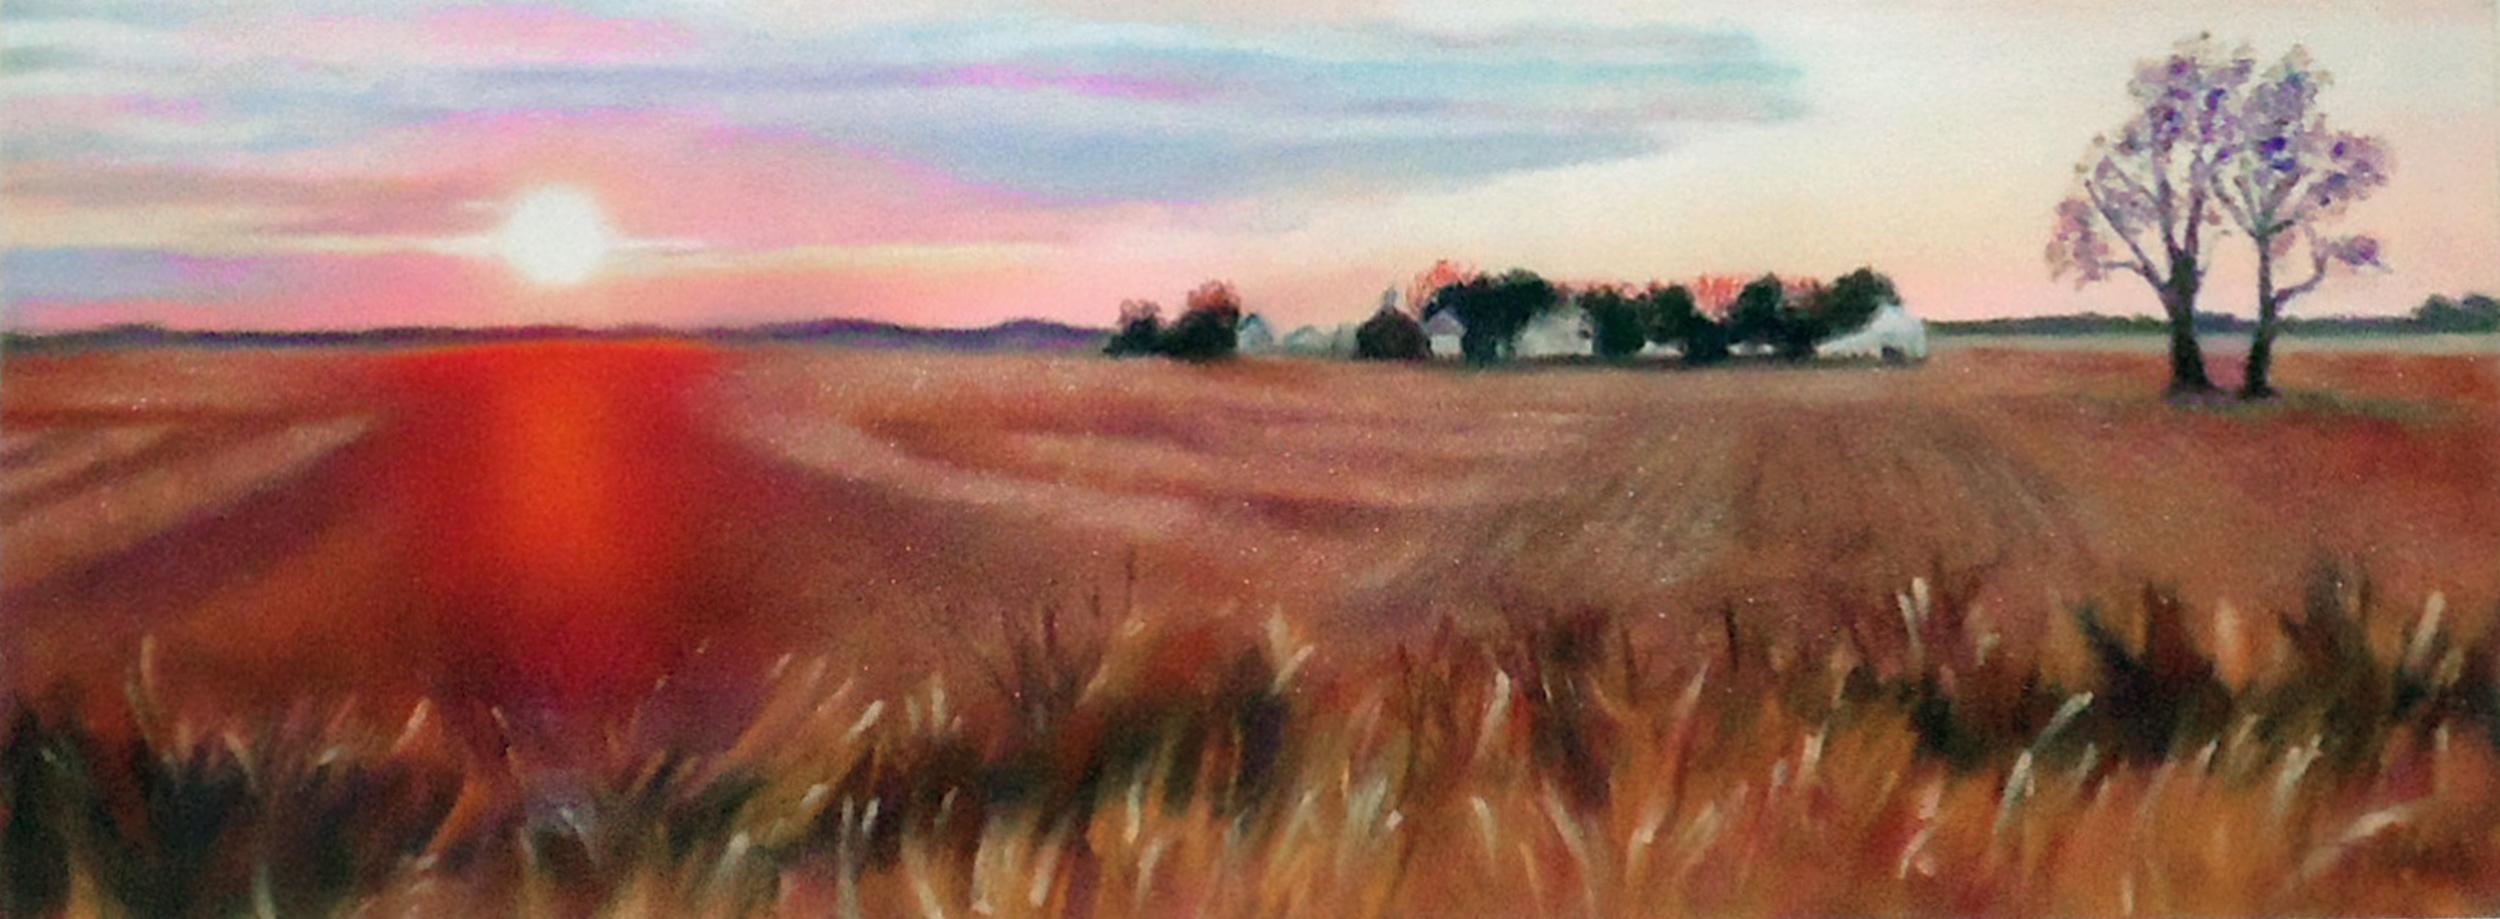 Midwest Sunset 12 x 5 pastel.jpg